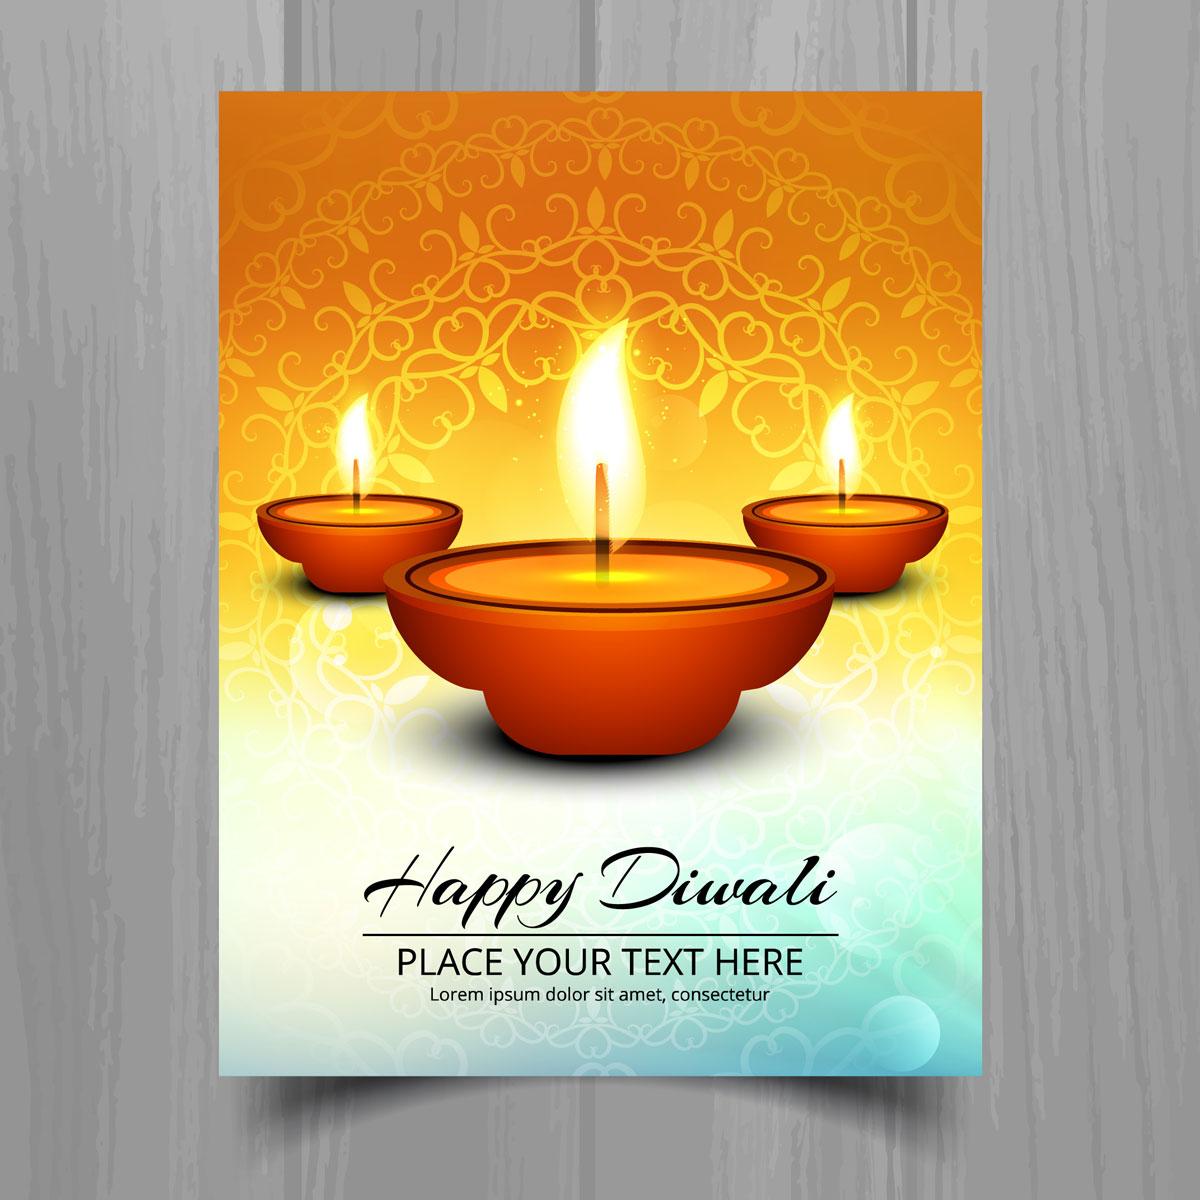 beautiful happy diwali diya oil lamp festival template